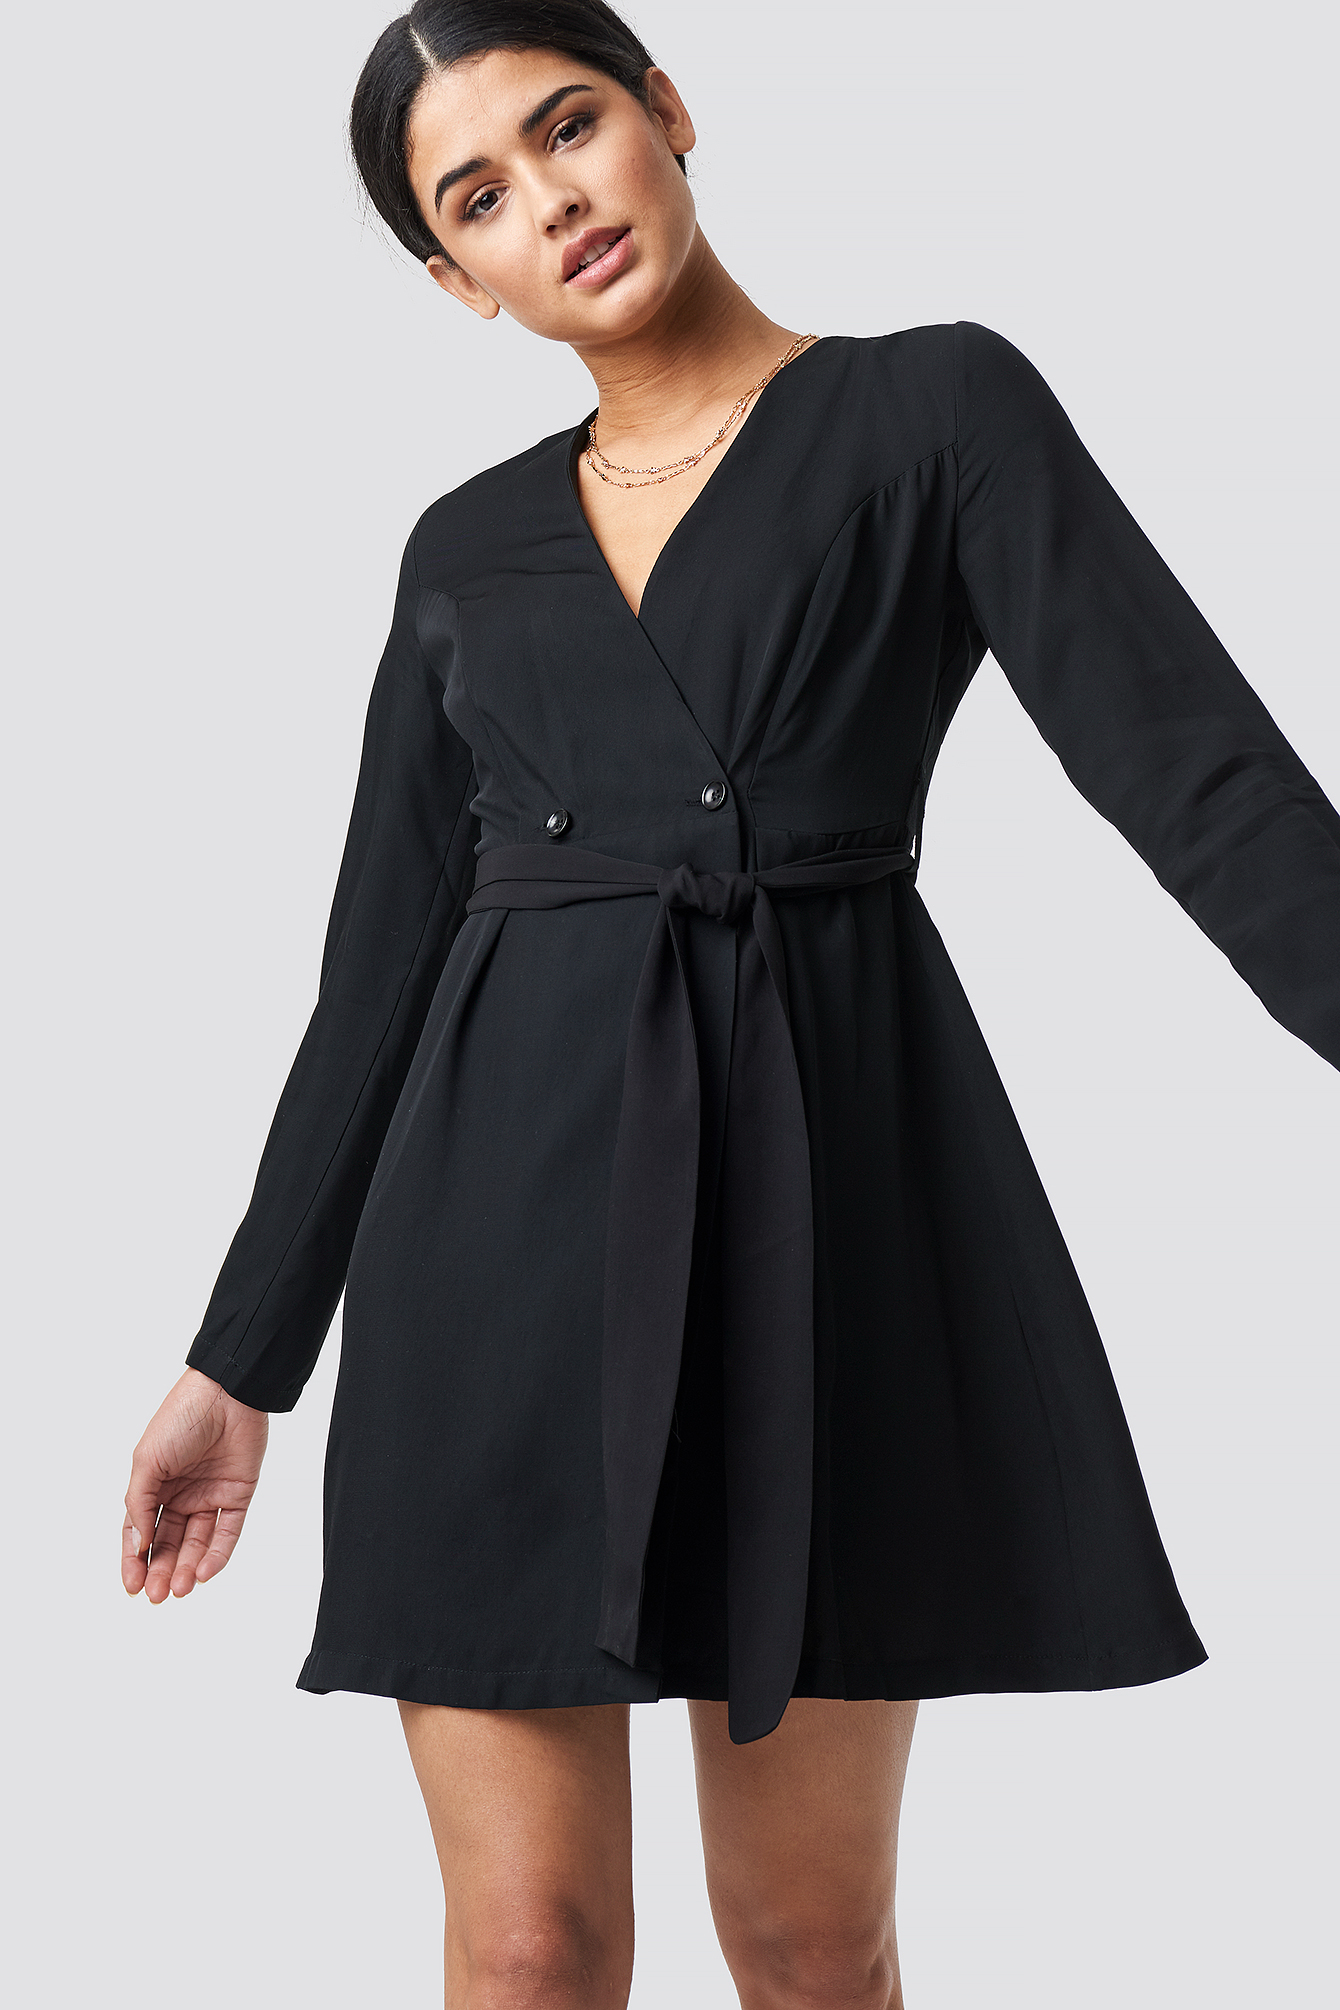 Waist Binding Detailed Dress NA-KD.COM